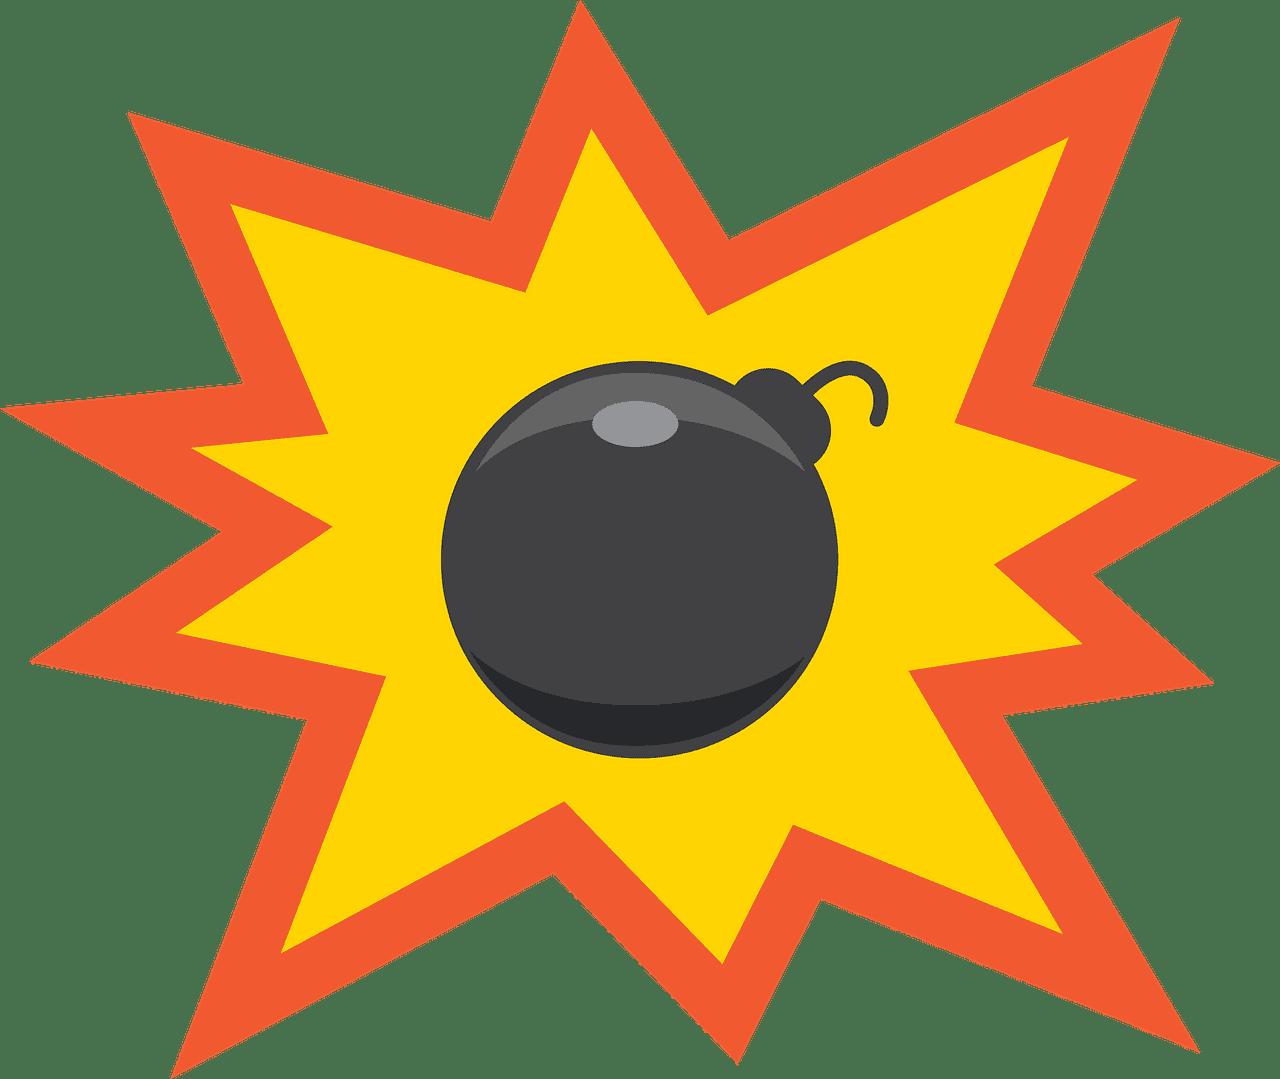 Bomb clipart transparent background 8